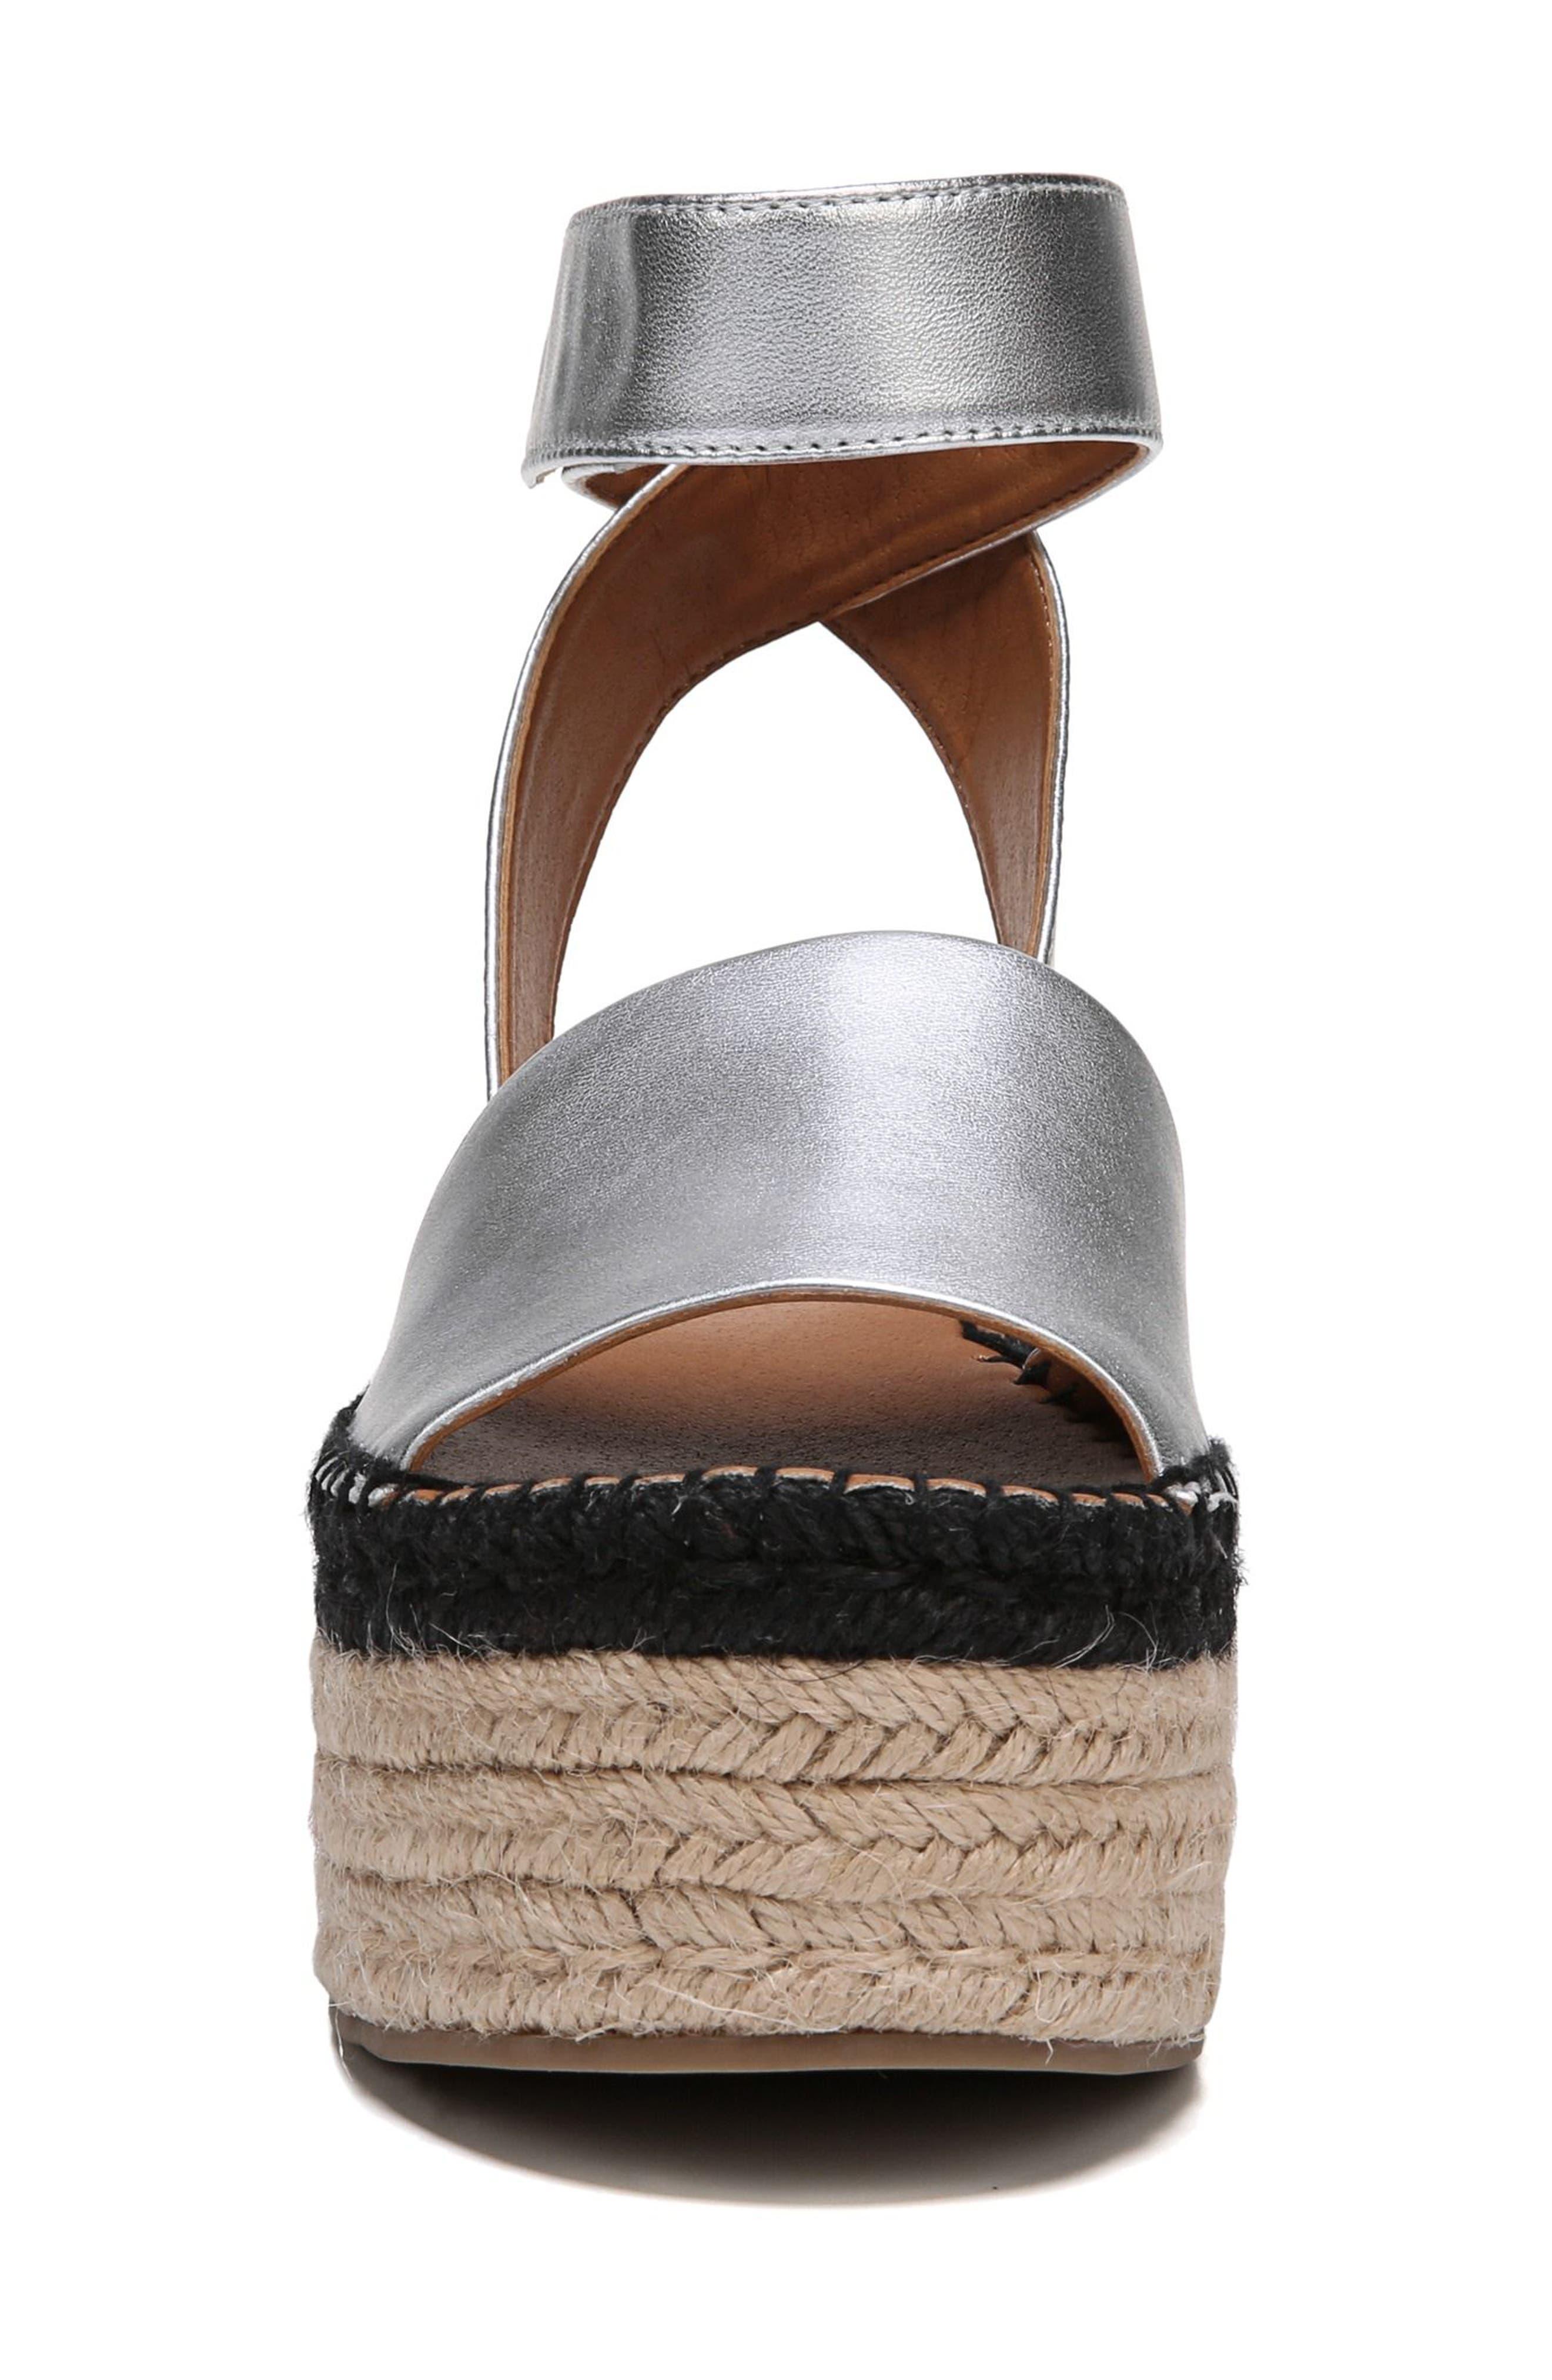 Maisi Platform Espadrille Sandal,                             Alternate thumbnail 4, color,                             Silver Leather